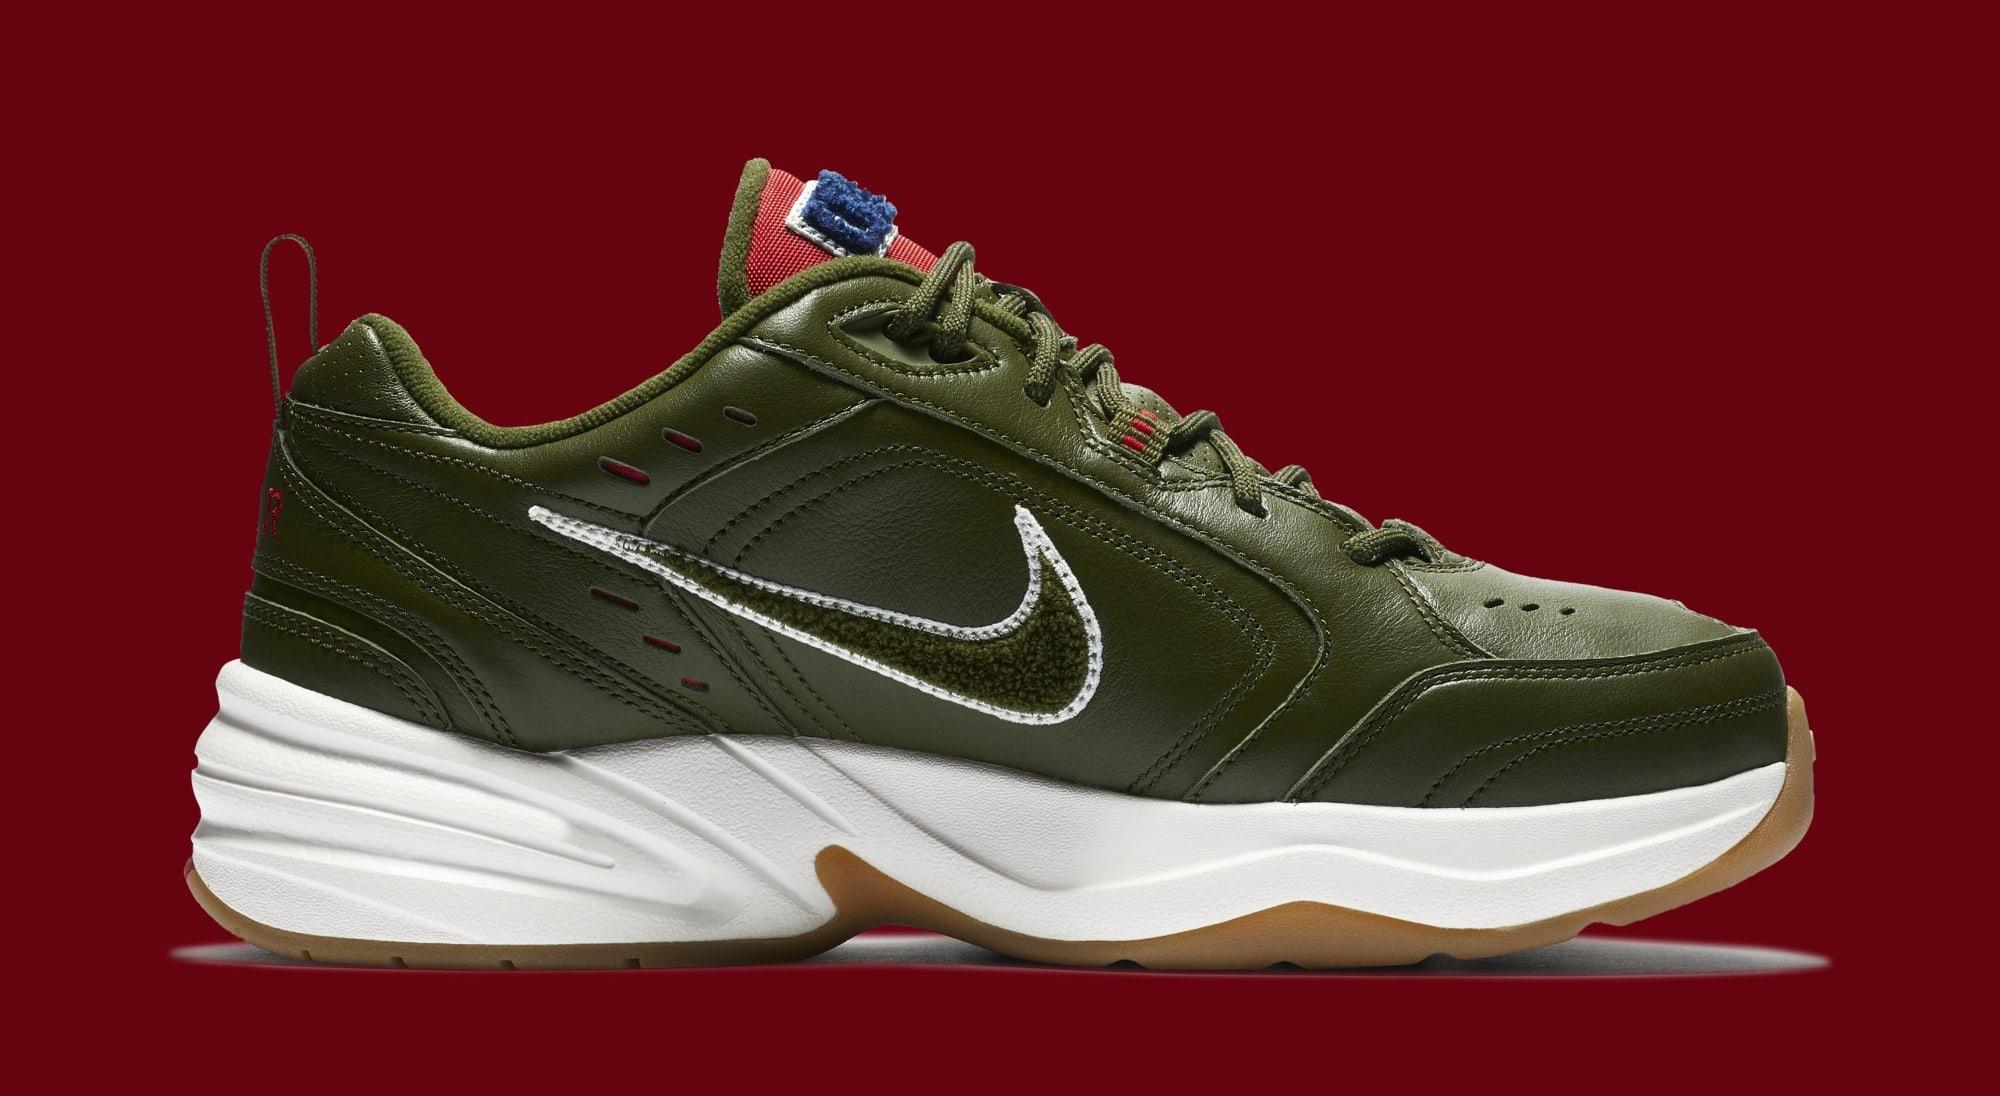 Nike Air Monarch 4 'Weekend Campout' AV6676-300 (Medial)